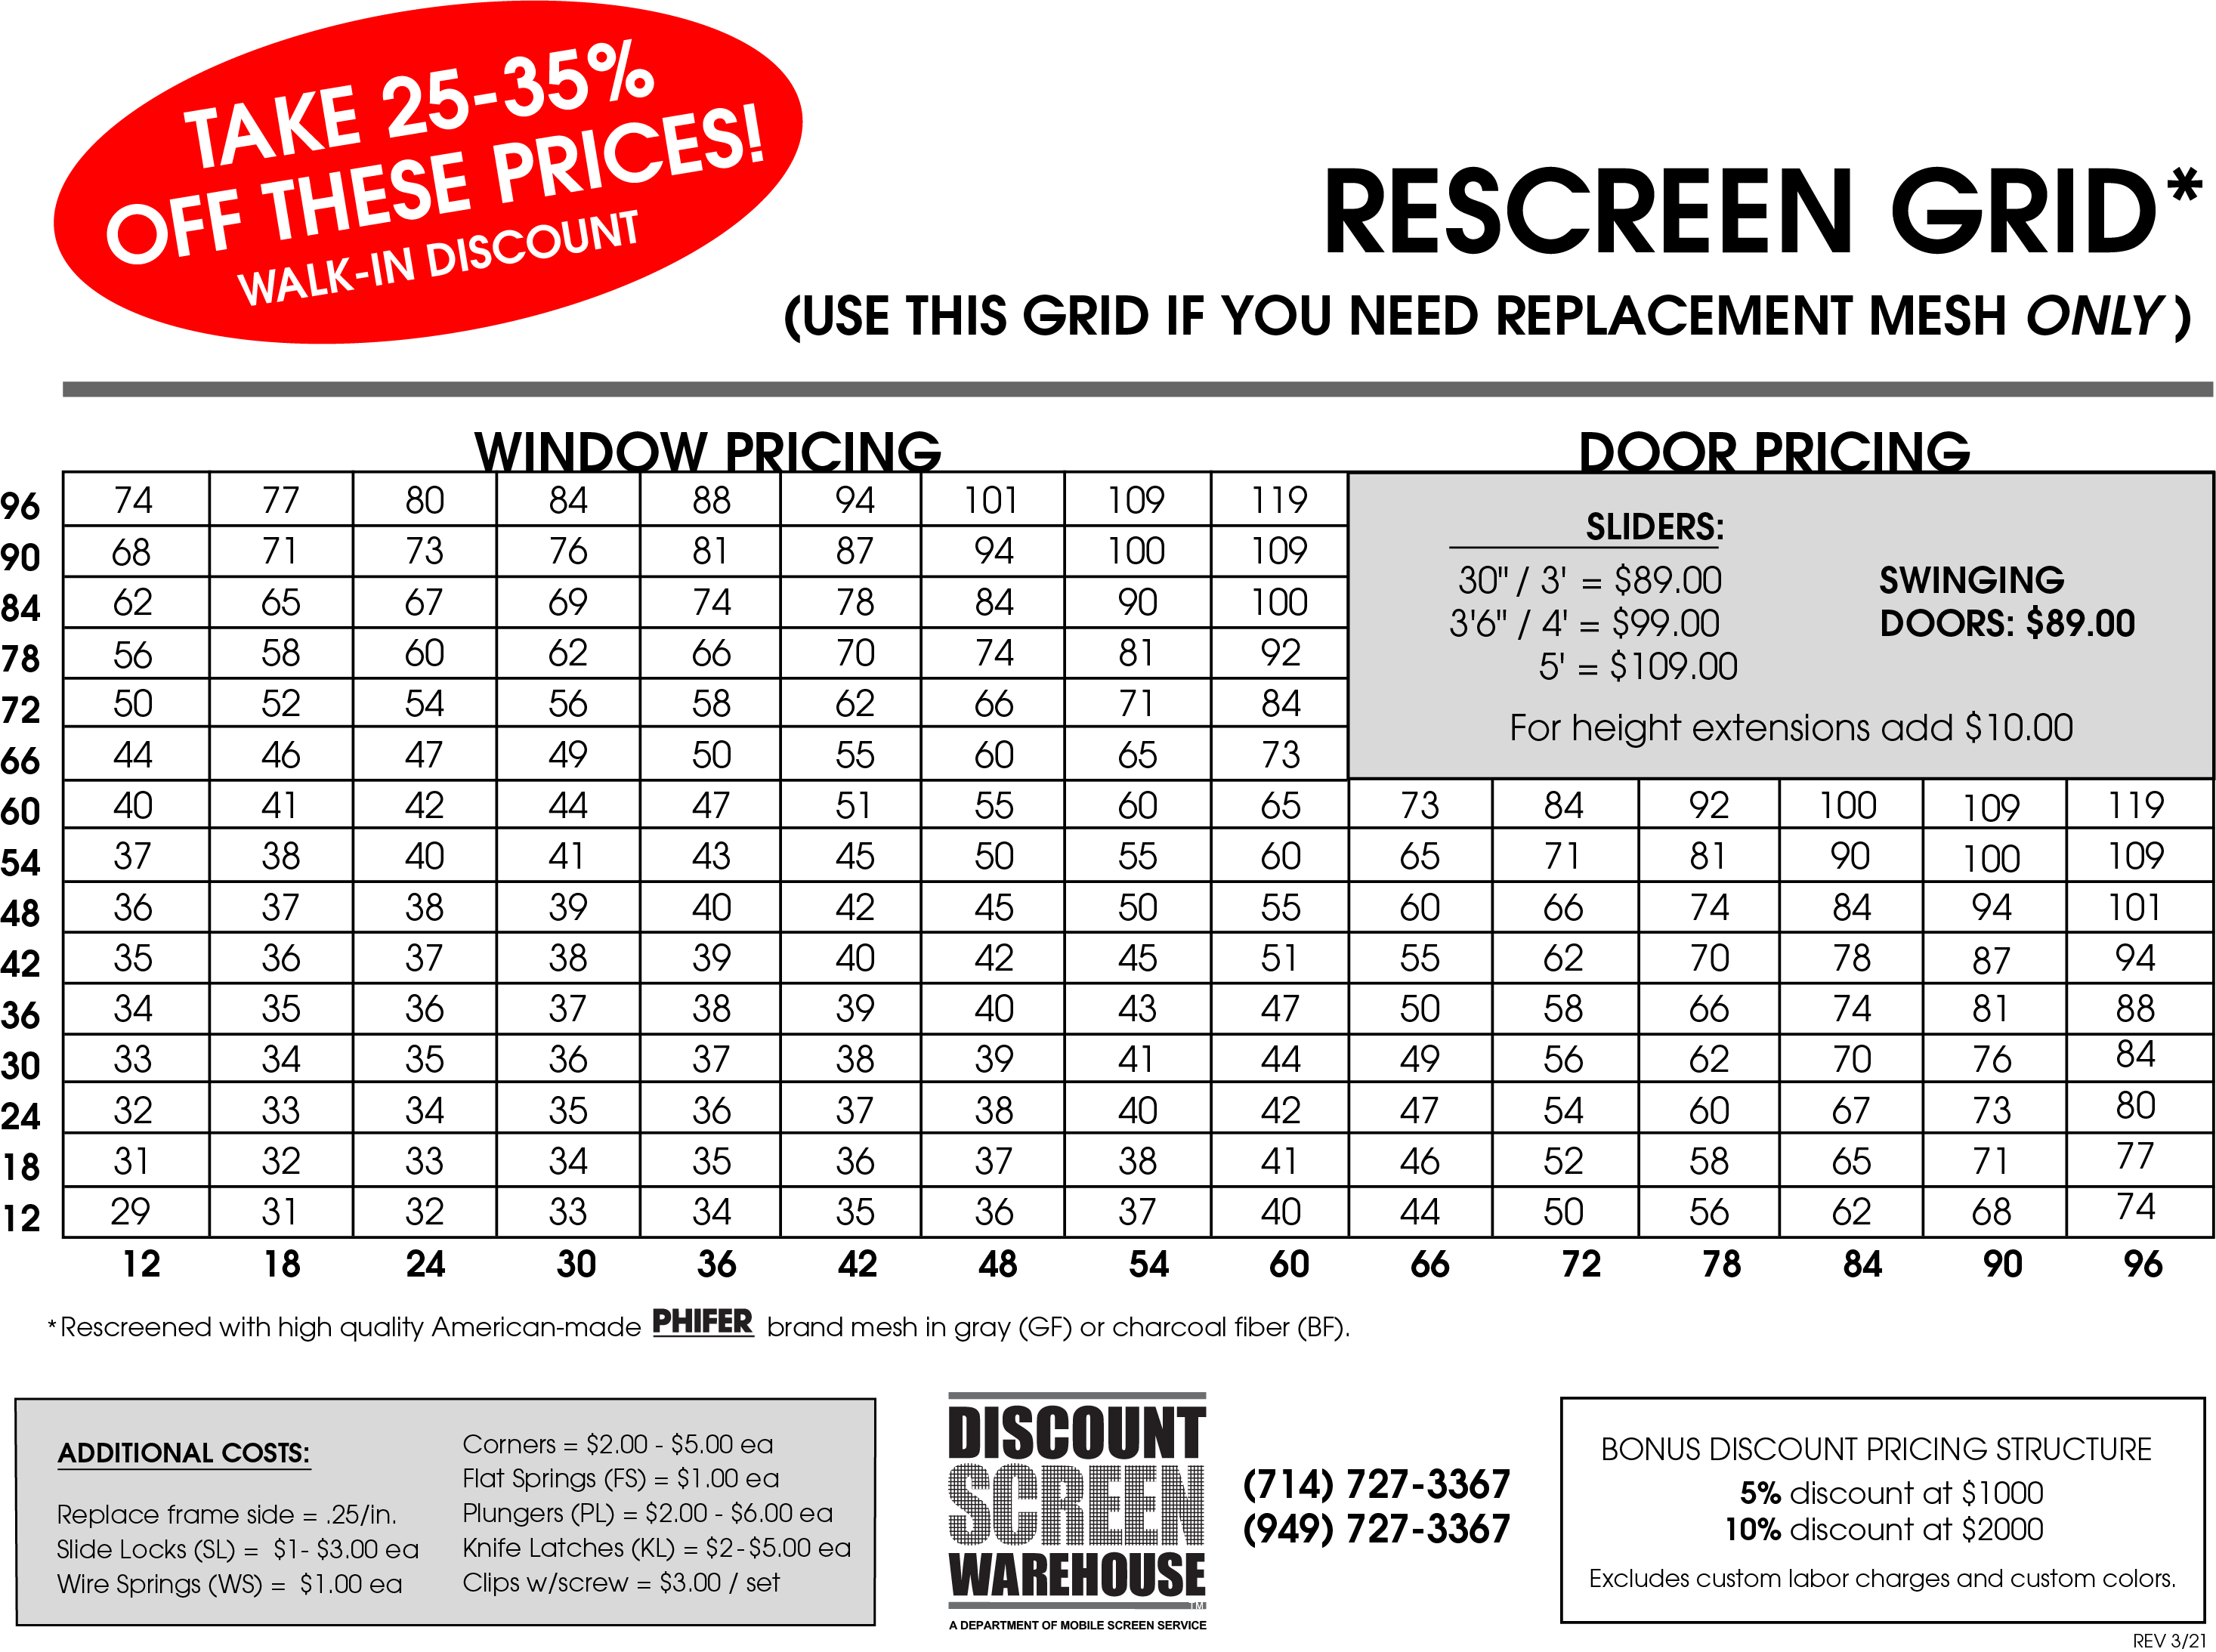 DSW Price Sheet-RE 4-21